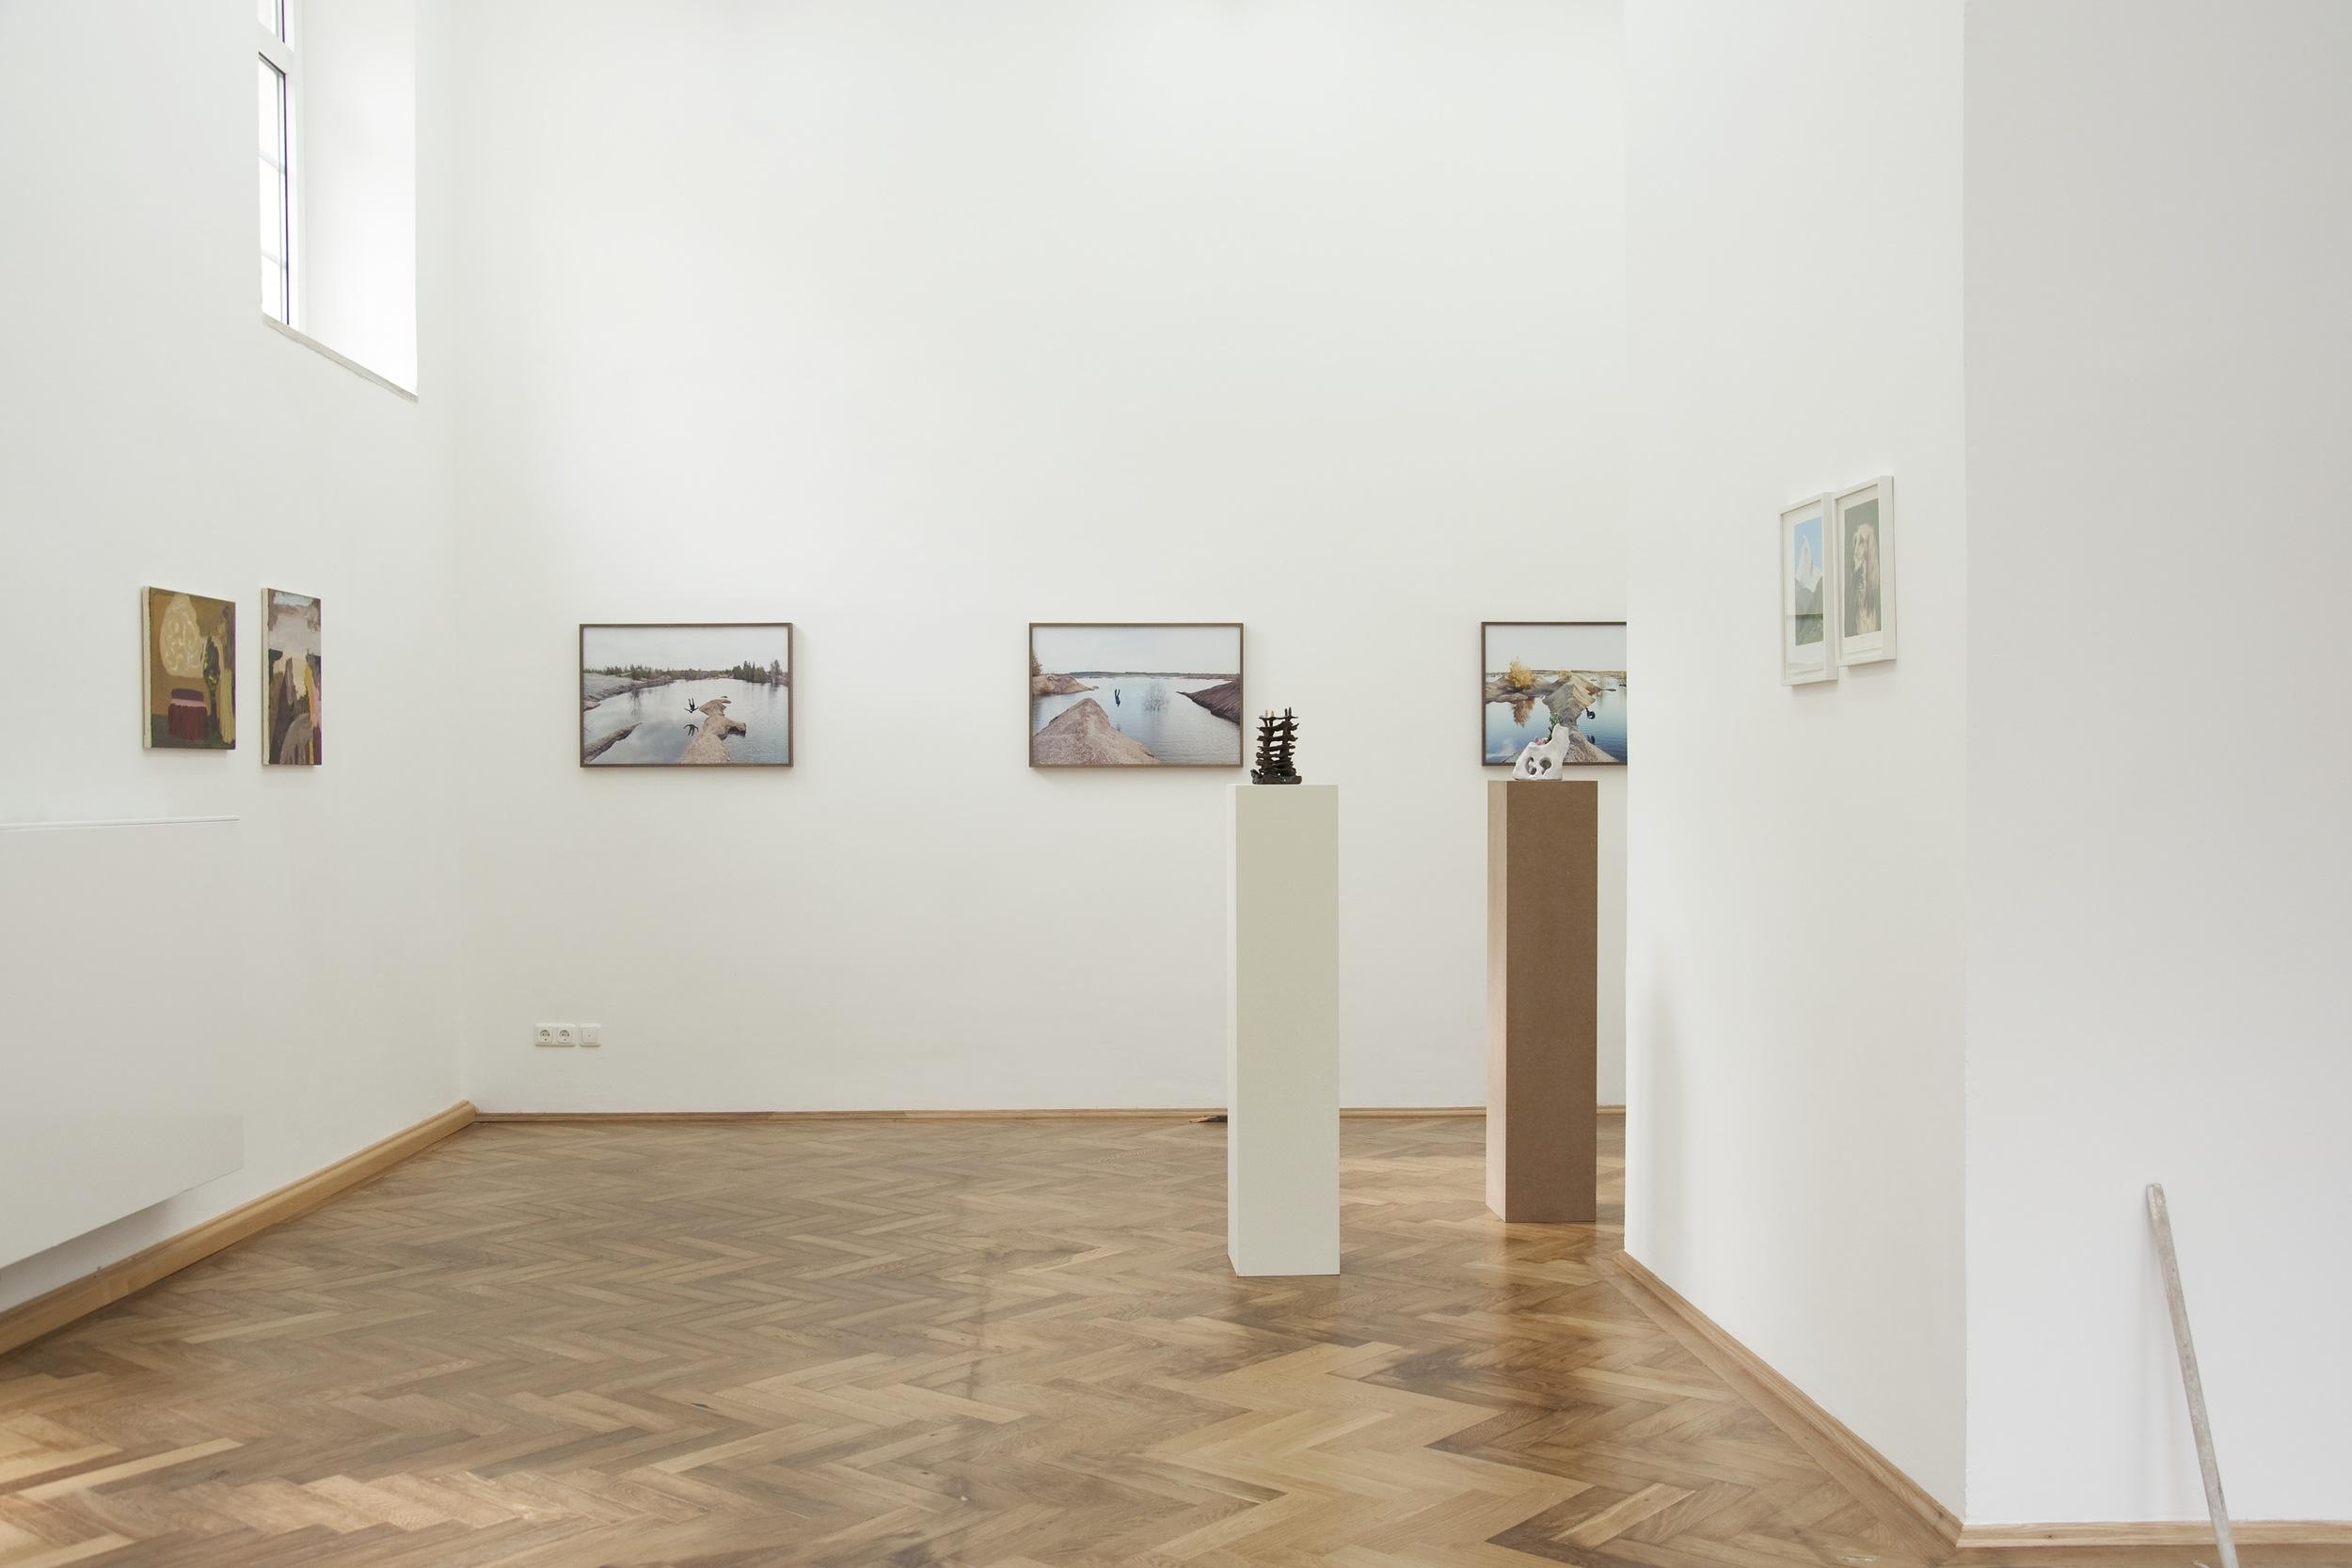 Veronika Hilger, Sebastian Stumpf, Haris Epaminonda, Thomas Geiger